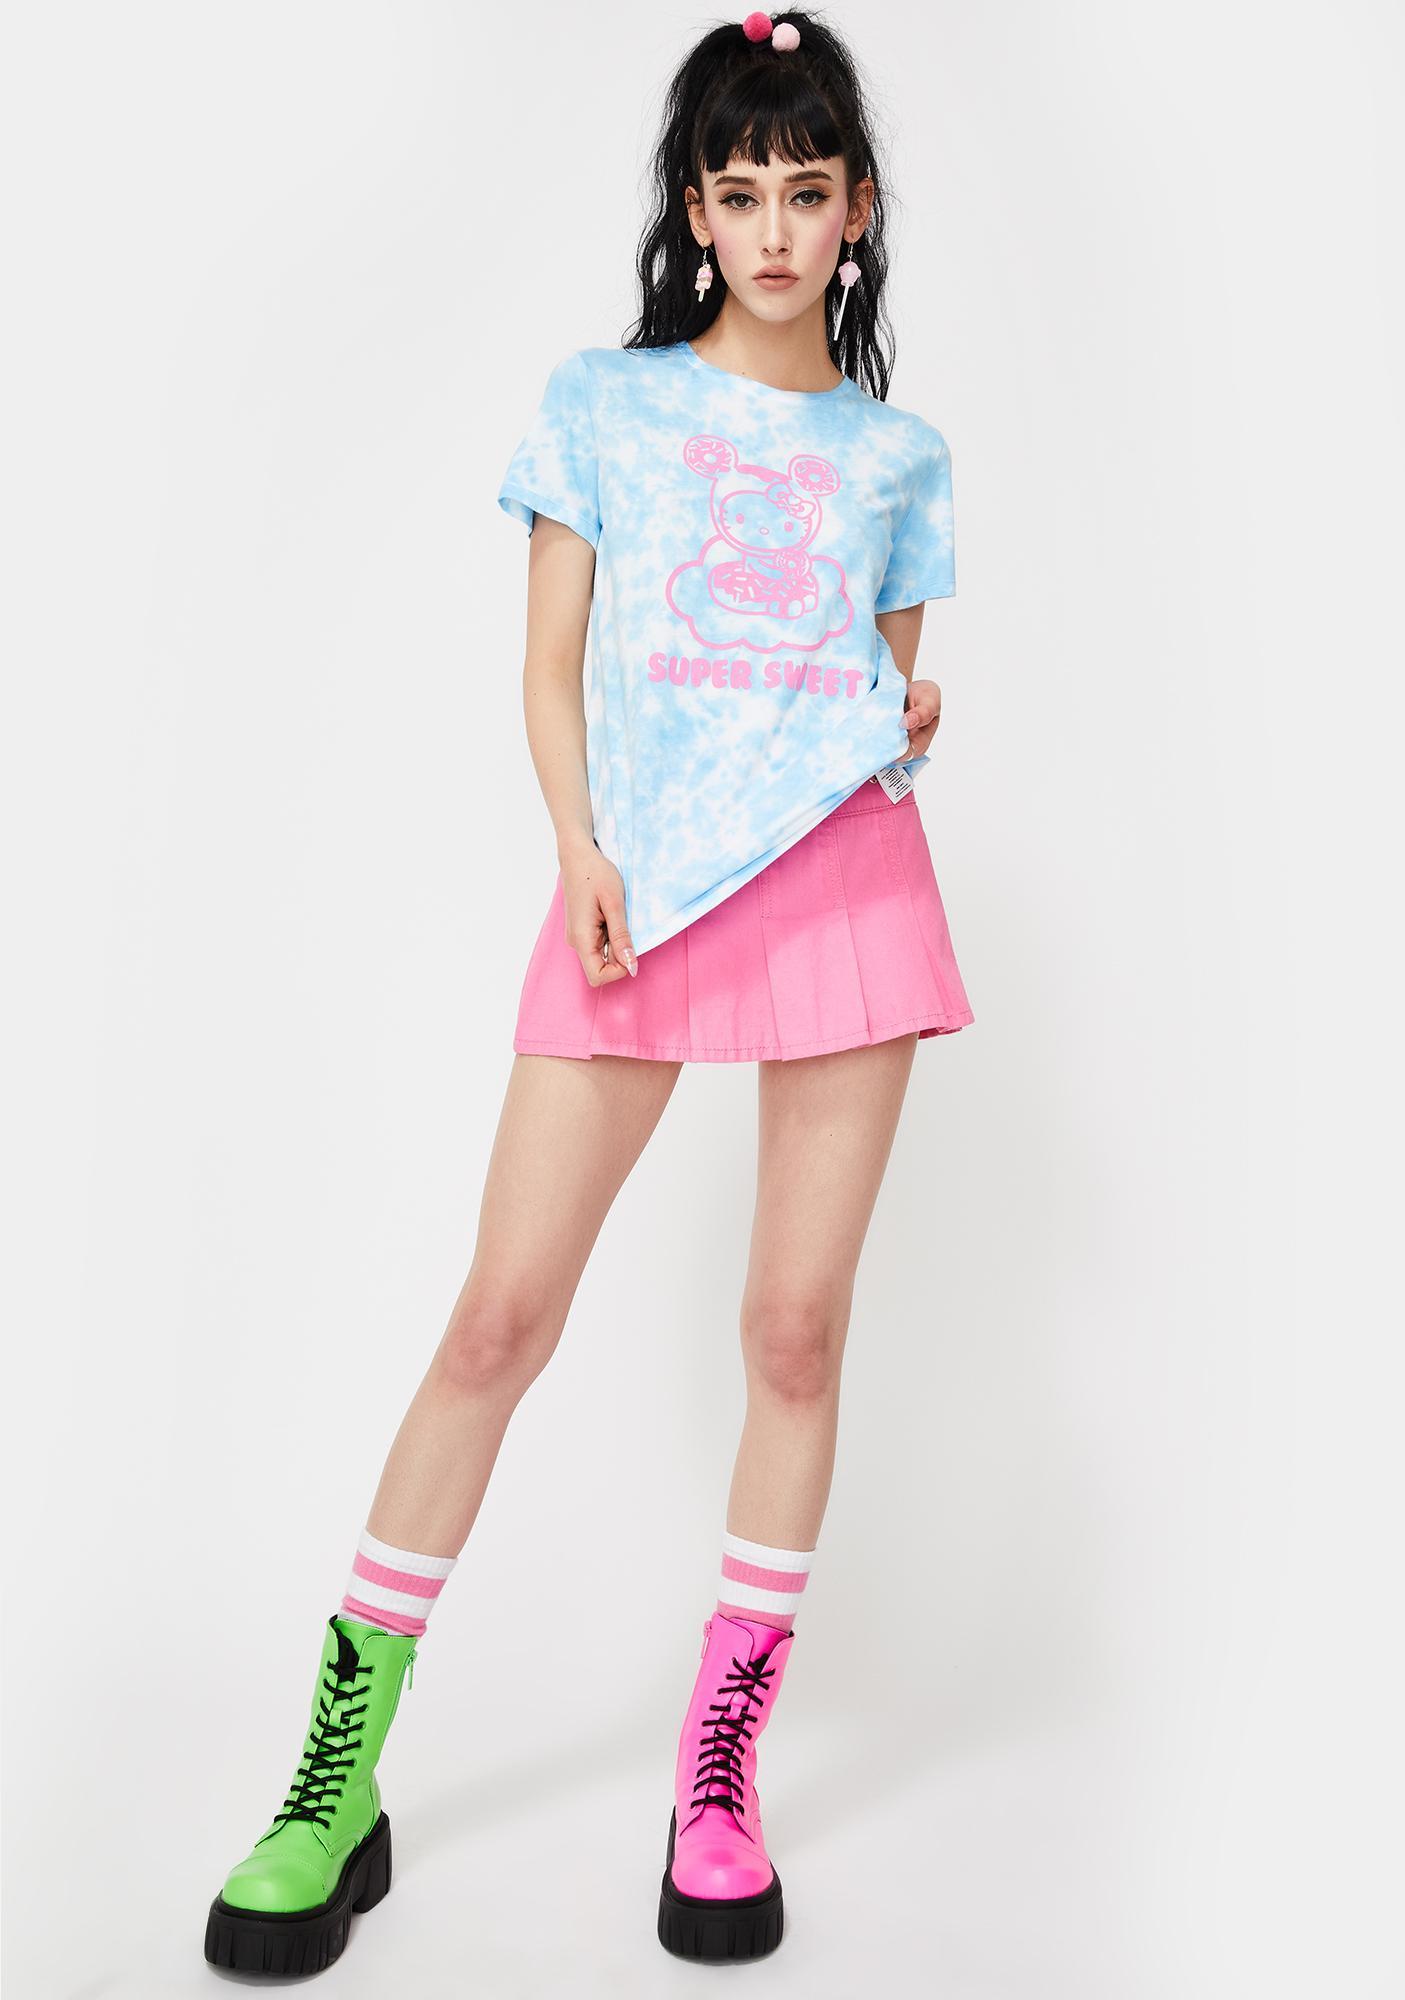 Tokidoki X Hello Kitty Cloudy Donut Tie Dye Graphic Tee